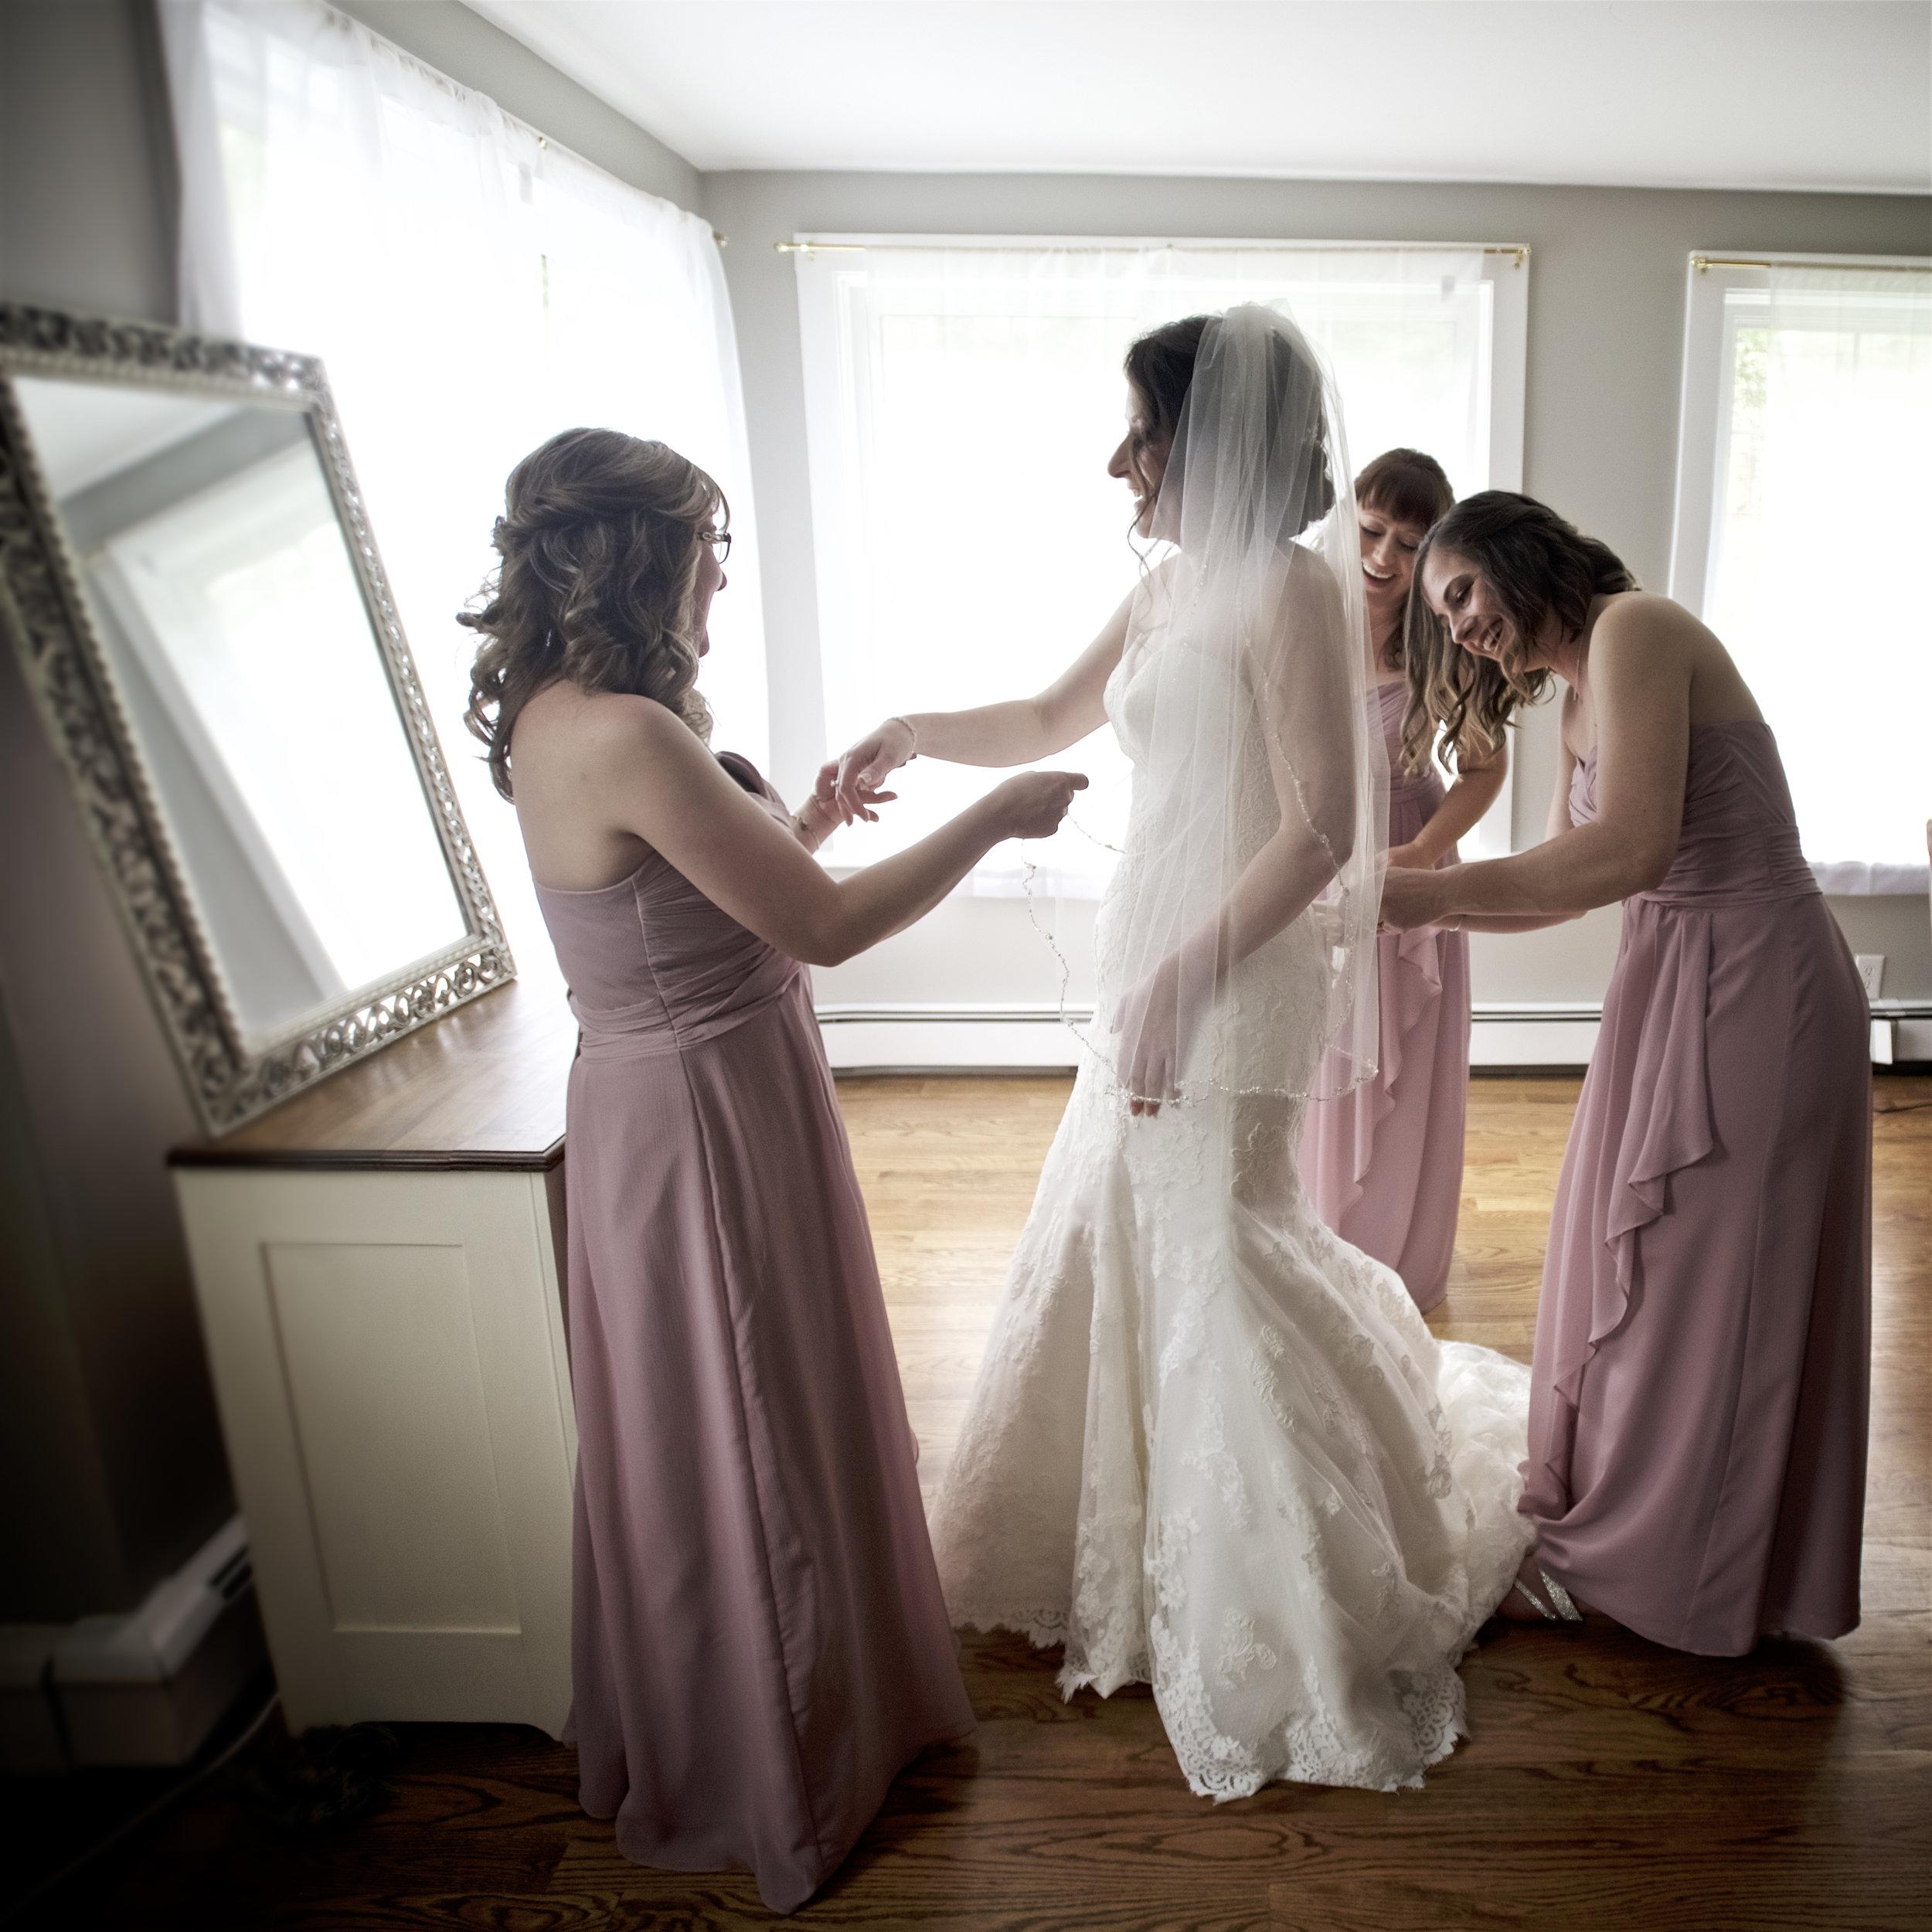 Lippincott manor wedding, wallkill ny wedding, photography, photos w.jpg